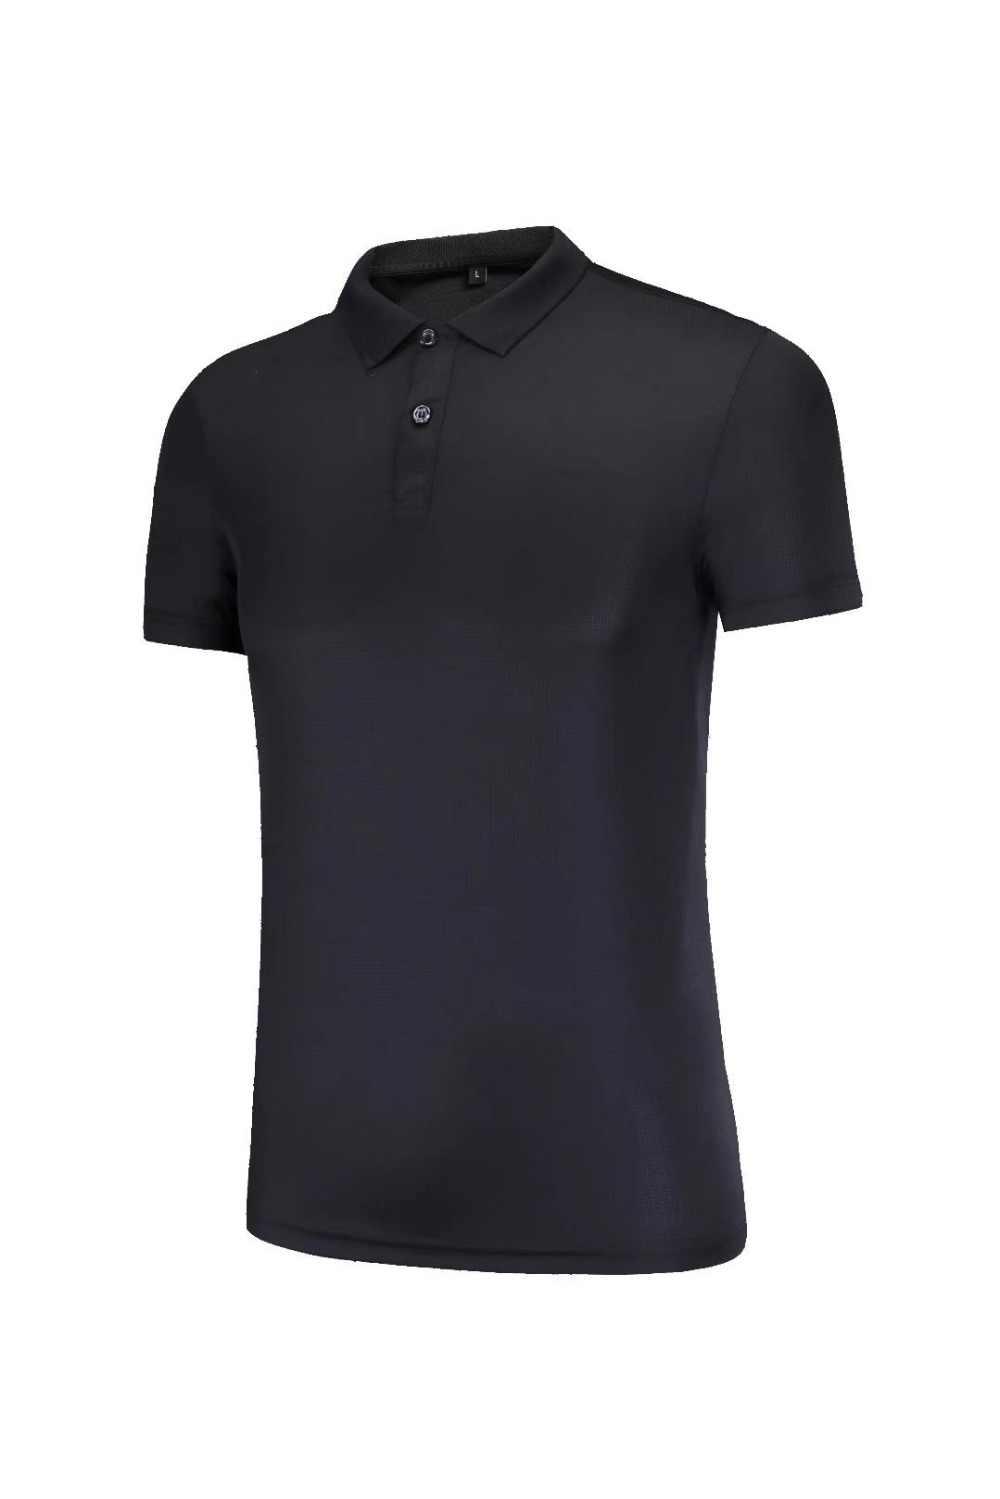 Custom Sport Polo Shirts - Ortsplanungsrevision Stadt Thun